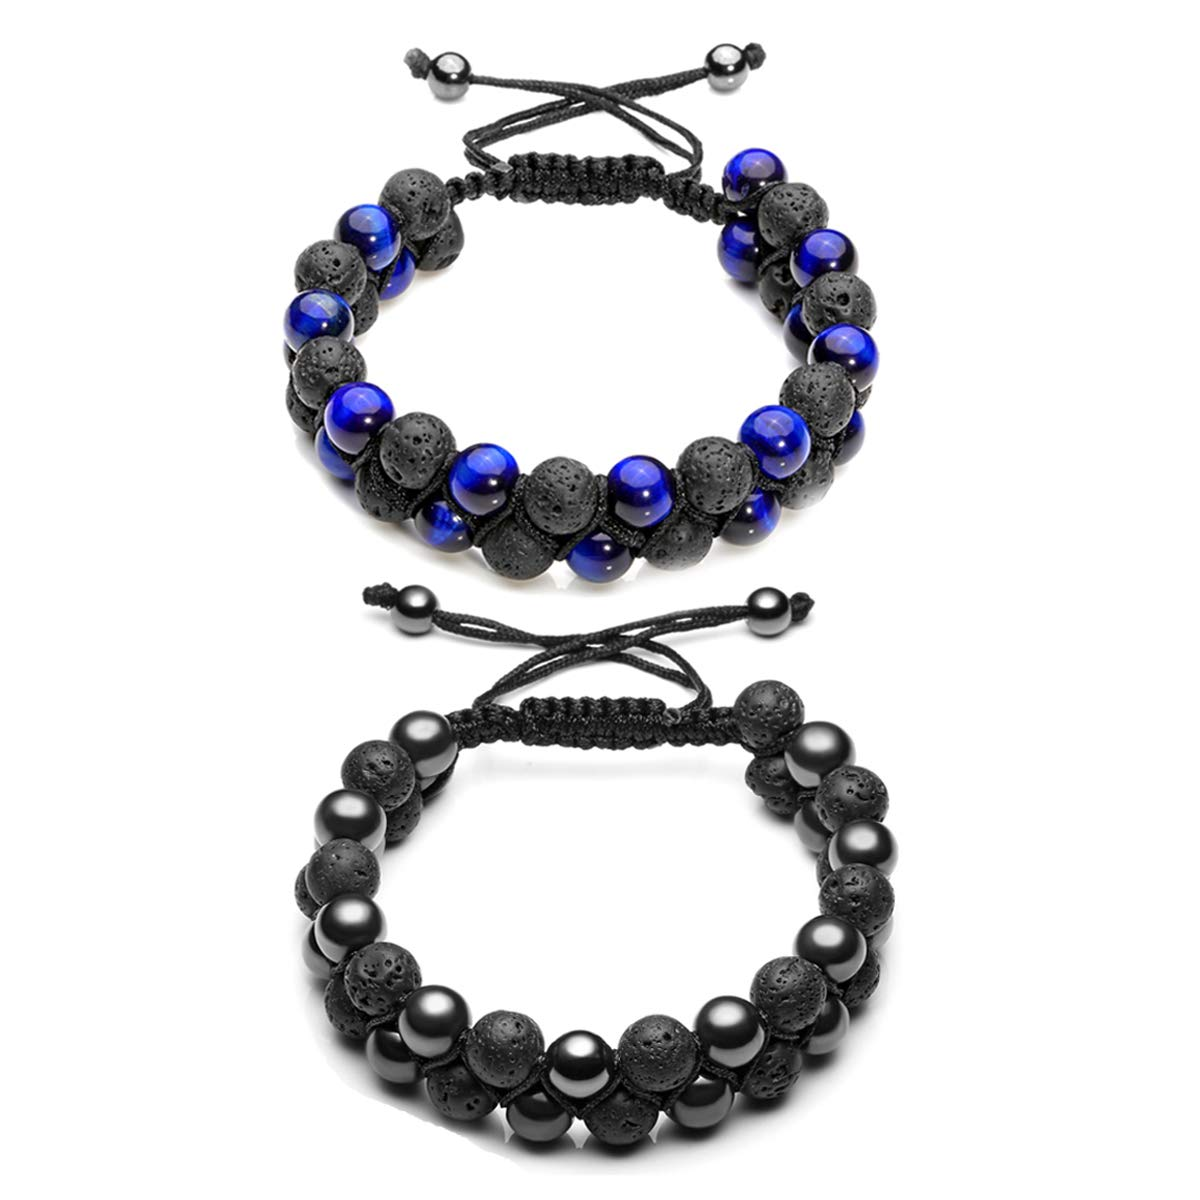 Crystal Tears Mens Lava Rock Bracelet-Tiger Eye Bead Hemitate Bracelet Men Natural Stone Yoga Essential Oil Braid Bracelets Double Layer Beads